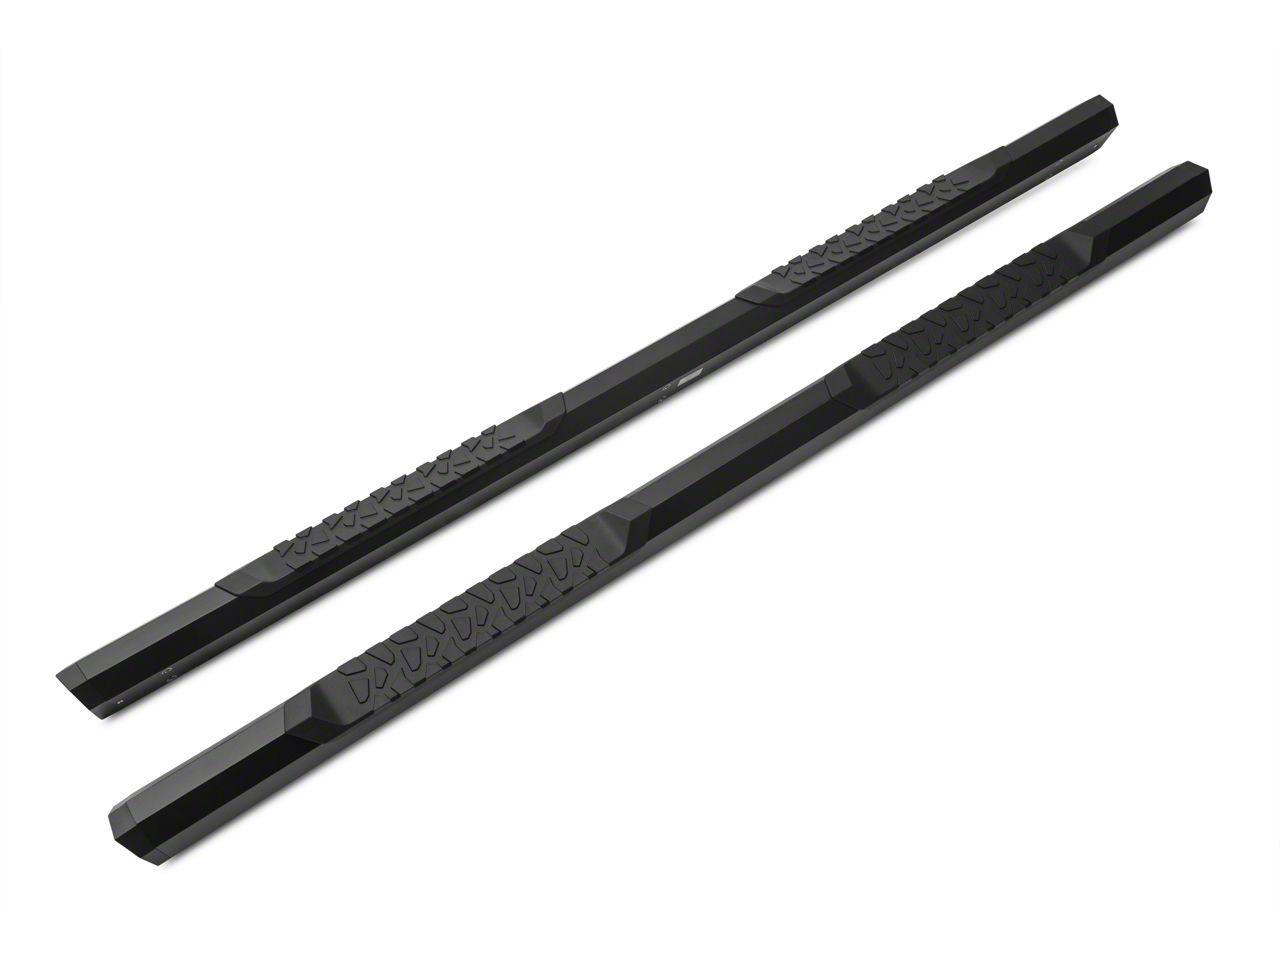 Barricade Octa Side Step Bars - Black (09-18 RAM 1500 Quad Cab, Crew Cab)